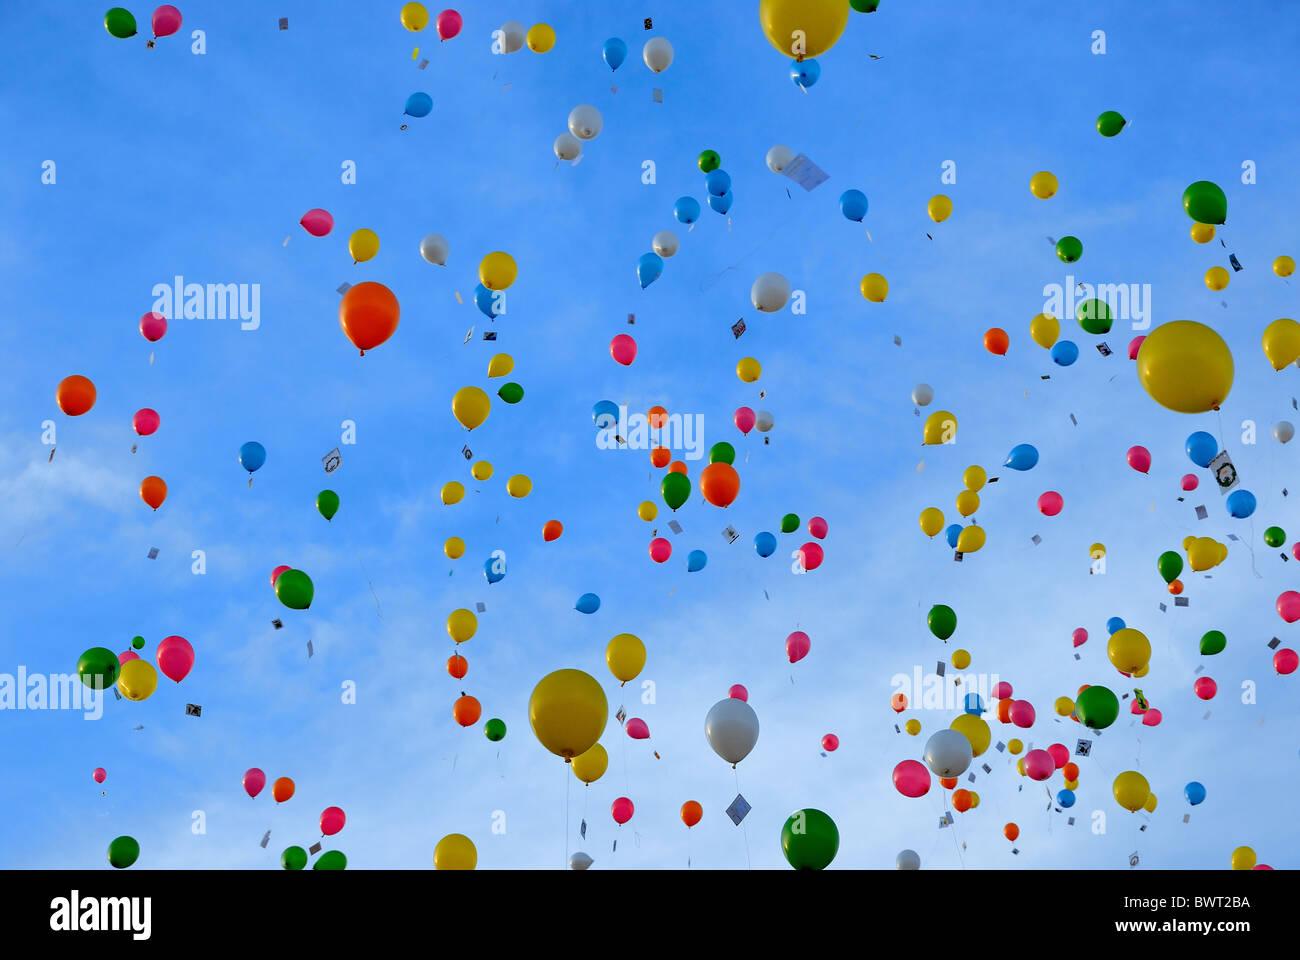 Globos de colores brillantes que flotan en un cielo azul. Imagen De Stock